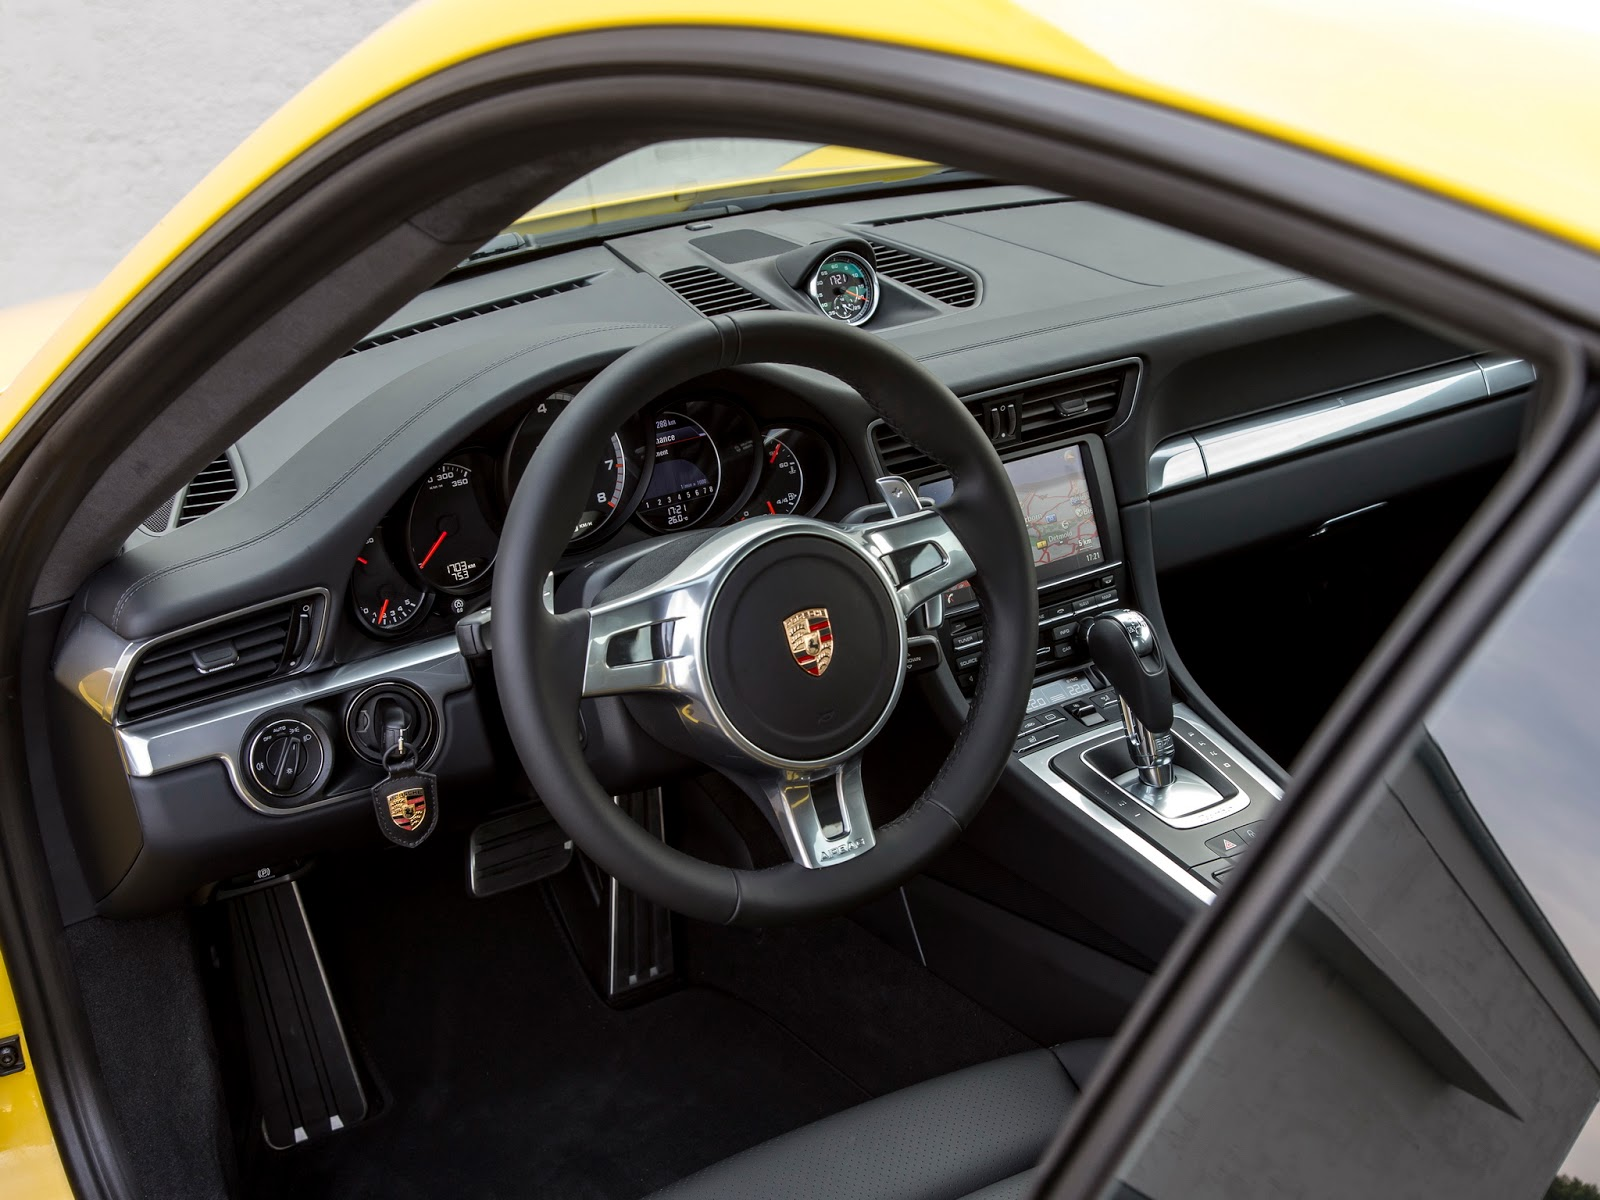 Porsche 911 Turbo - interior